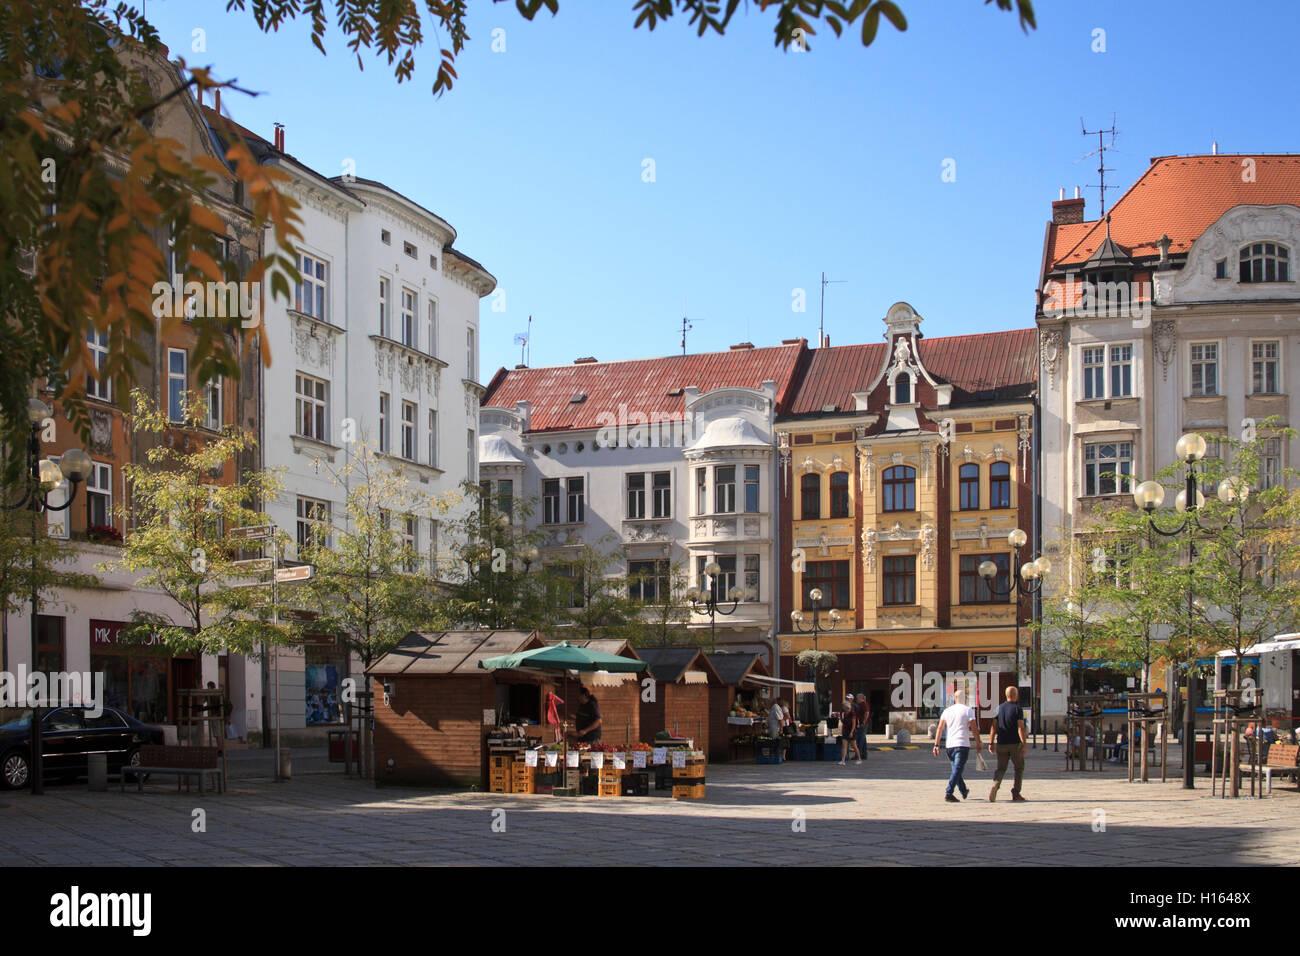 Jiraskovo Namesti, Ostrava. - Stock Image